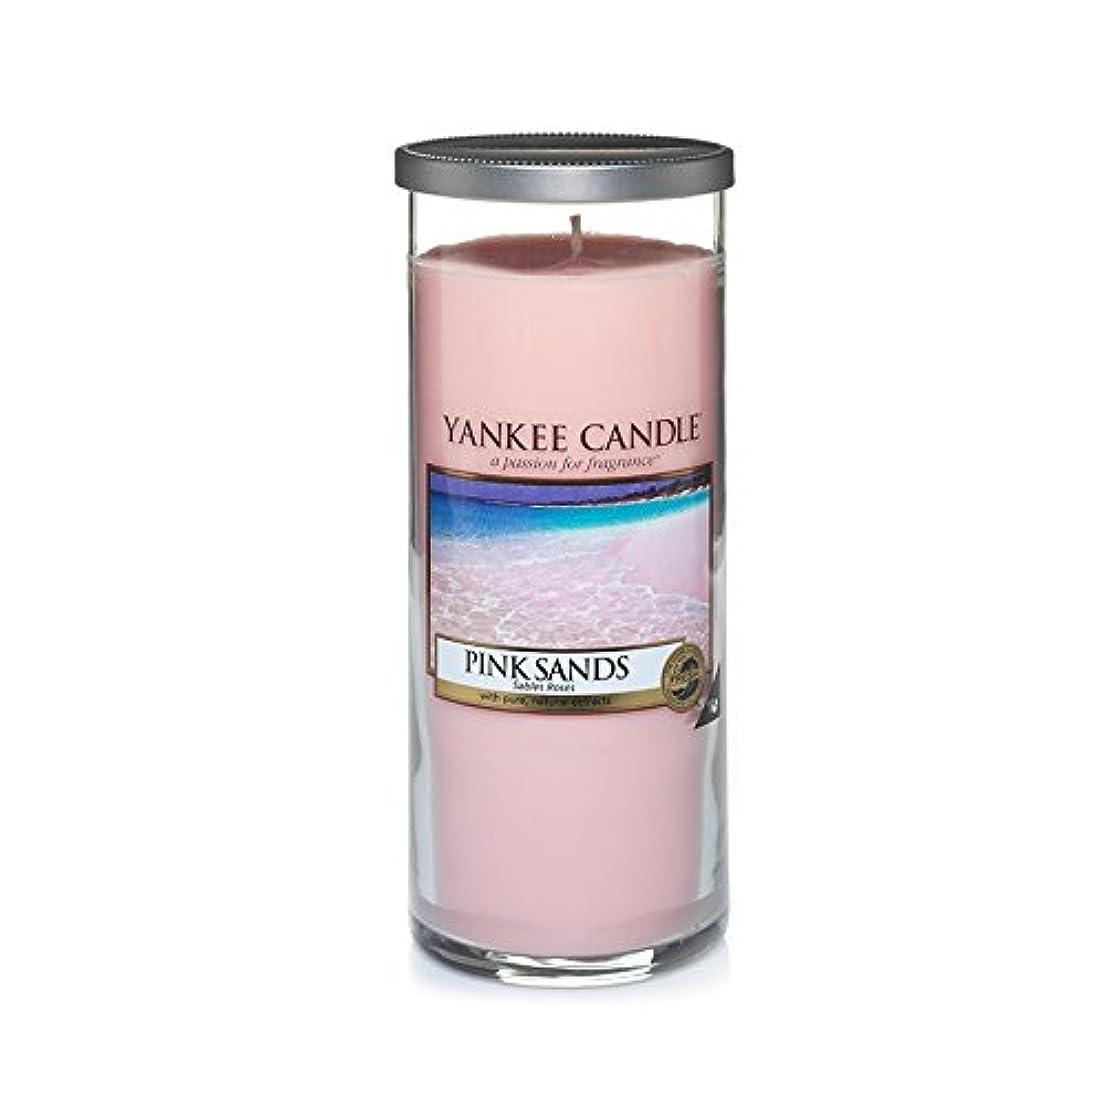 Yankee Candles Large Pillar Candle - Pink Sands? (Pack of 2) - ヤンキーキャンドル大きな柱キャンドル - ピンクの砂? (x2) [並行輸入品]